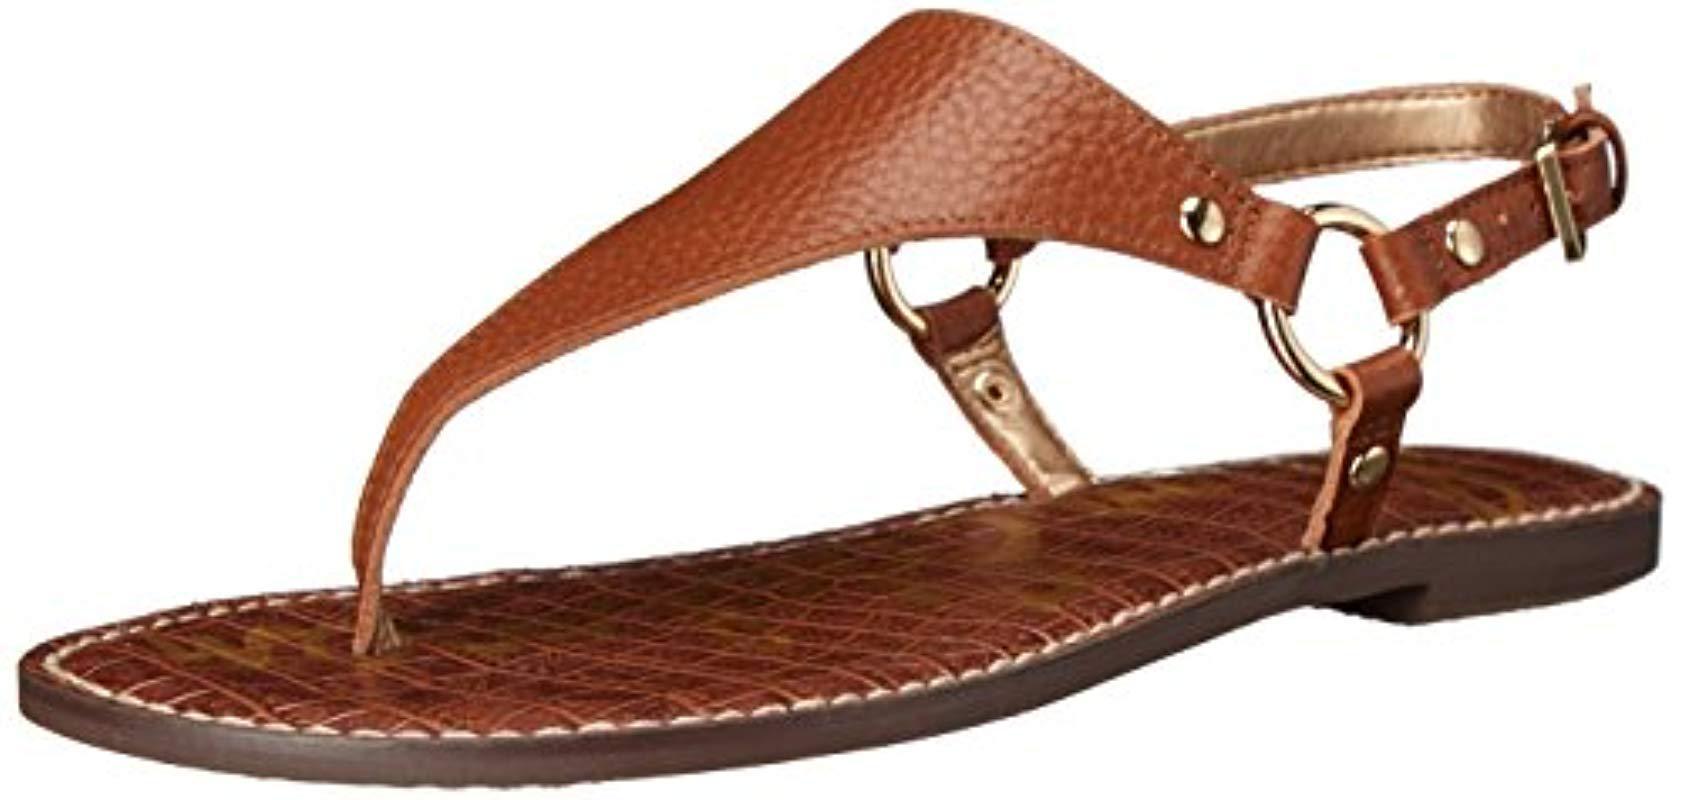 155d45c27 Lyst - Sam Edelman Greta Flat Sandal in Brown - Save 33%